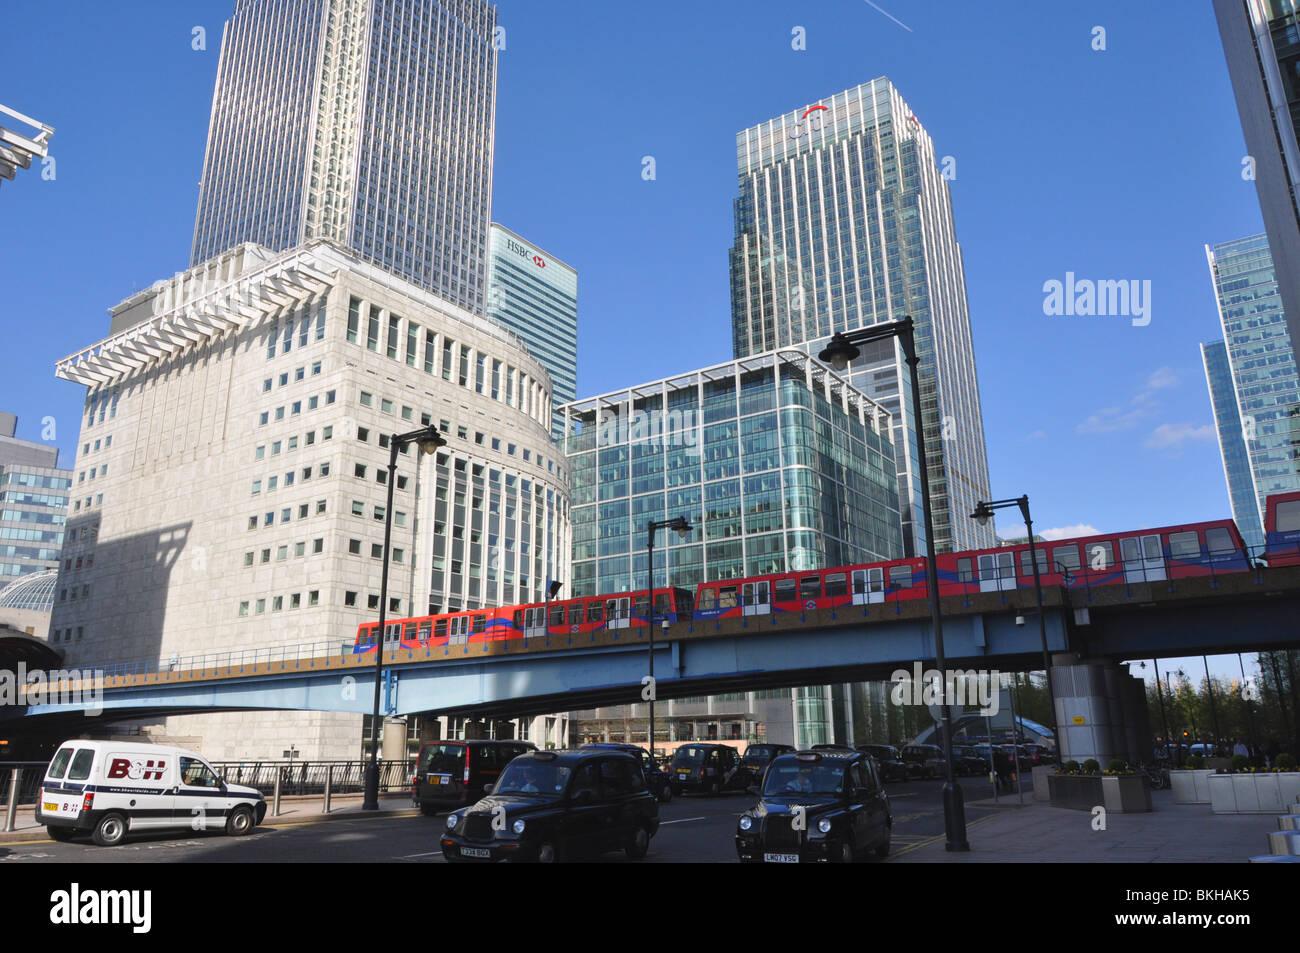 DLR  Canary Wharf London England UK - Stock Image